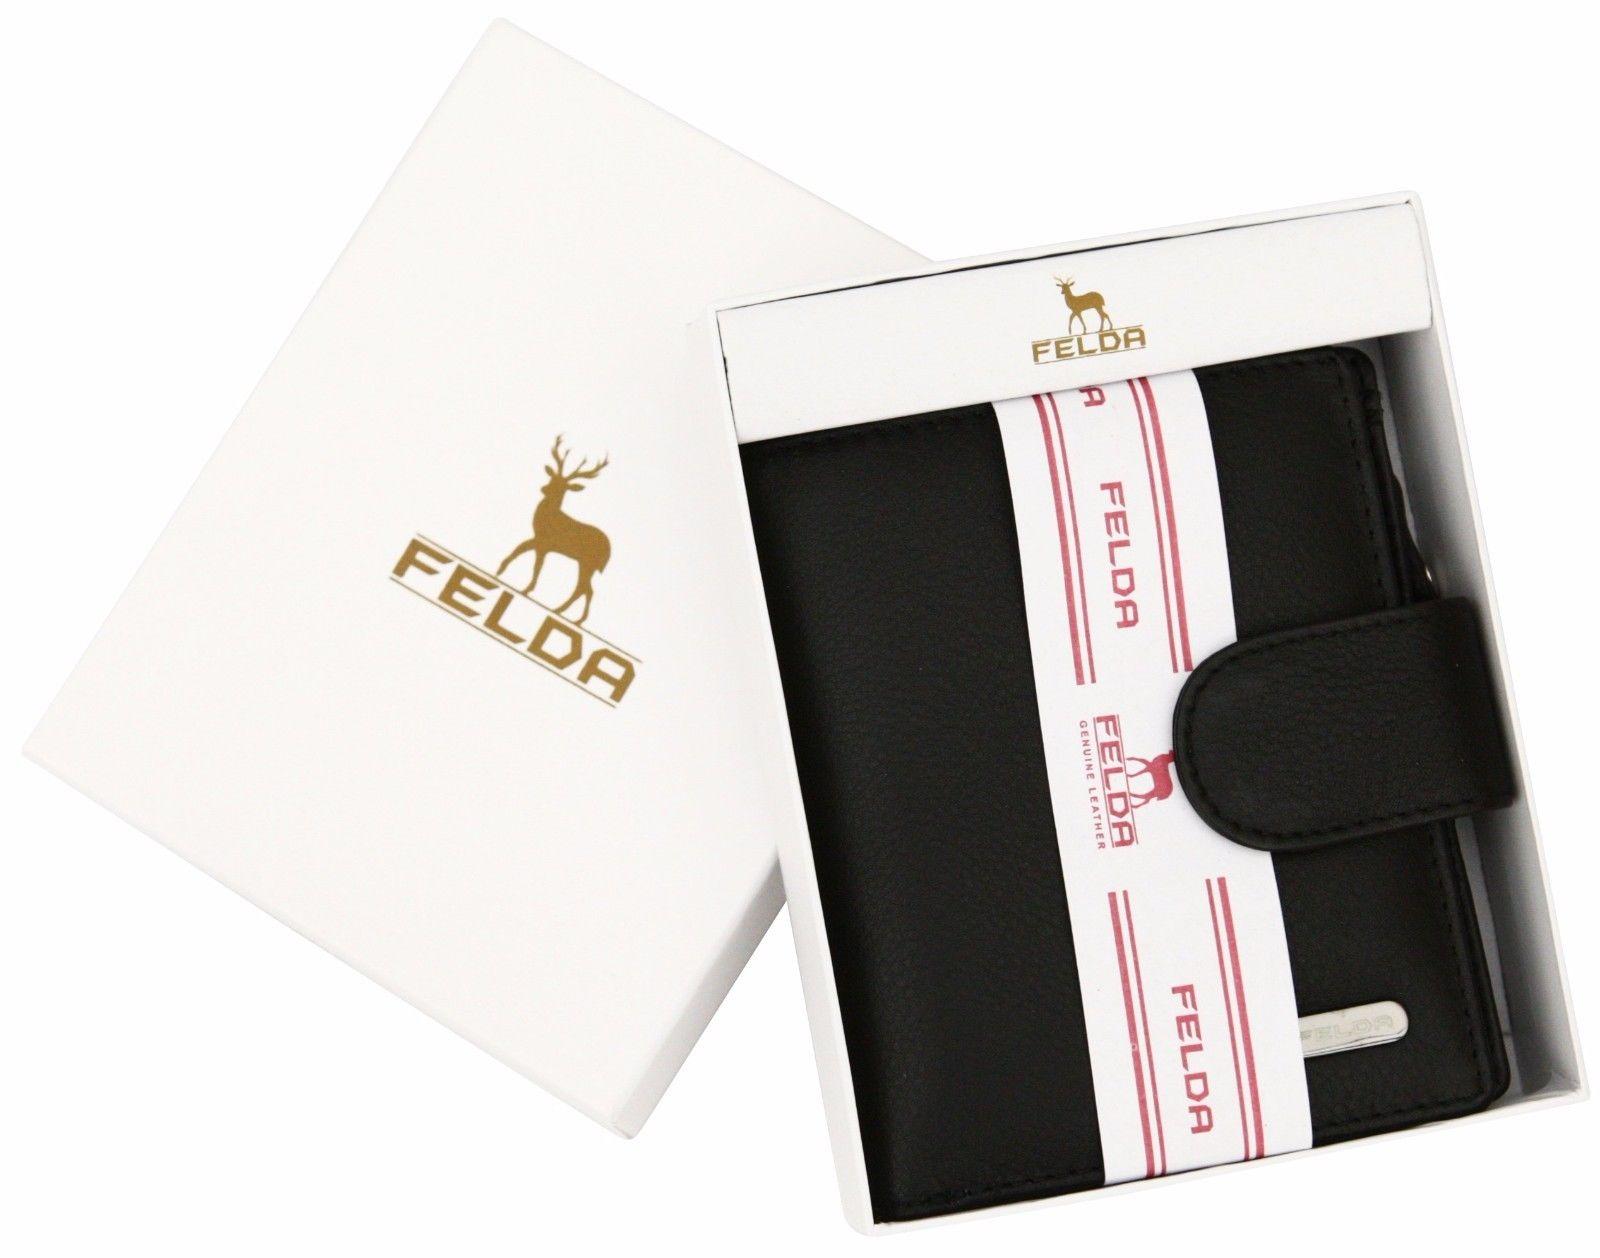 Felda-RFID-onorevoli-MEDAGLIA-amp-Card-Purse-Wallet-Genuine-Leather-Multi-SOFT-BOX-REGALO miniatura 10